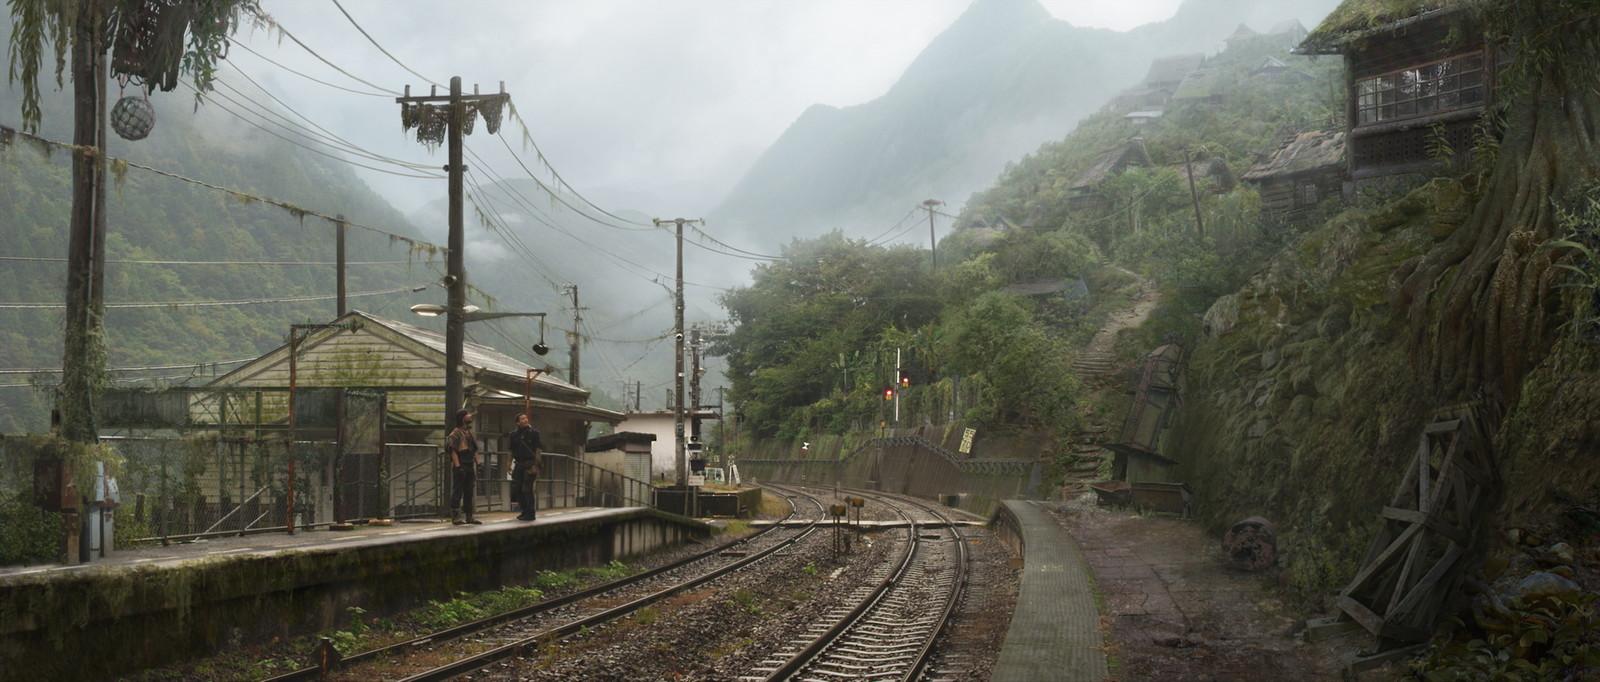 Station Exit